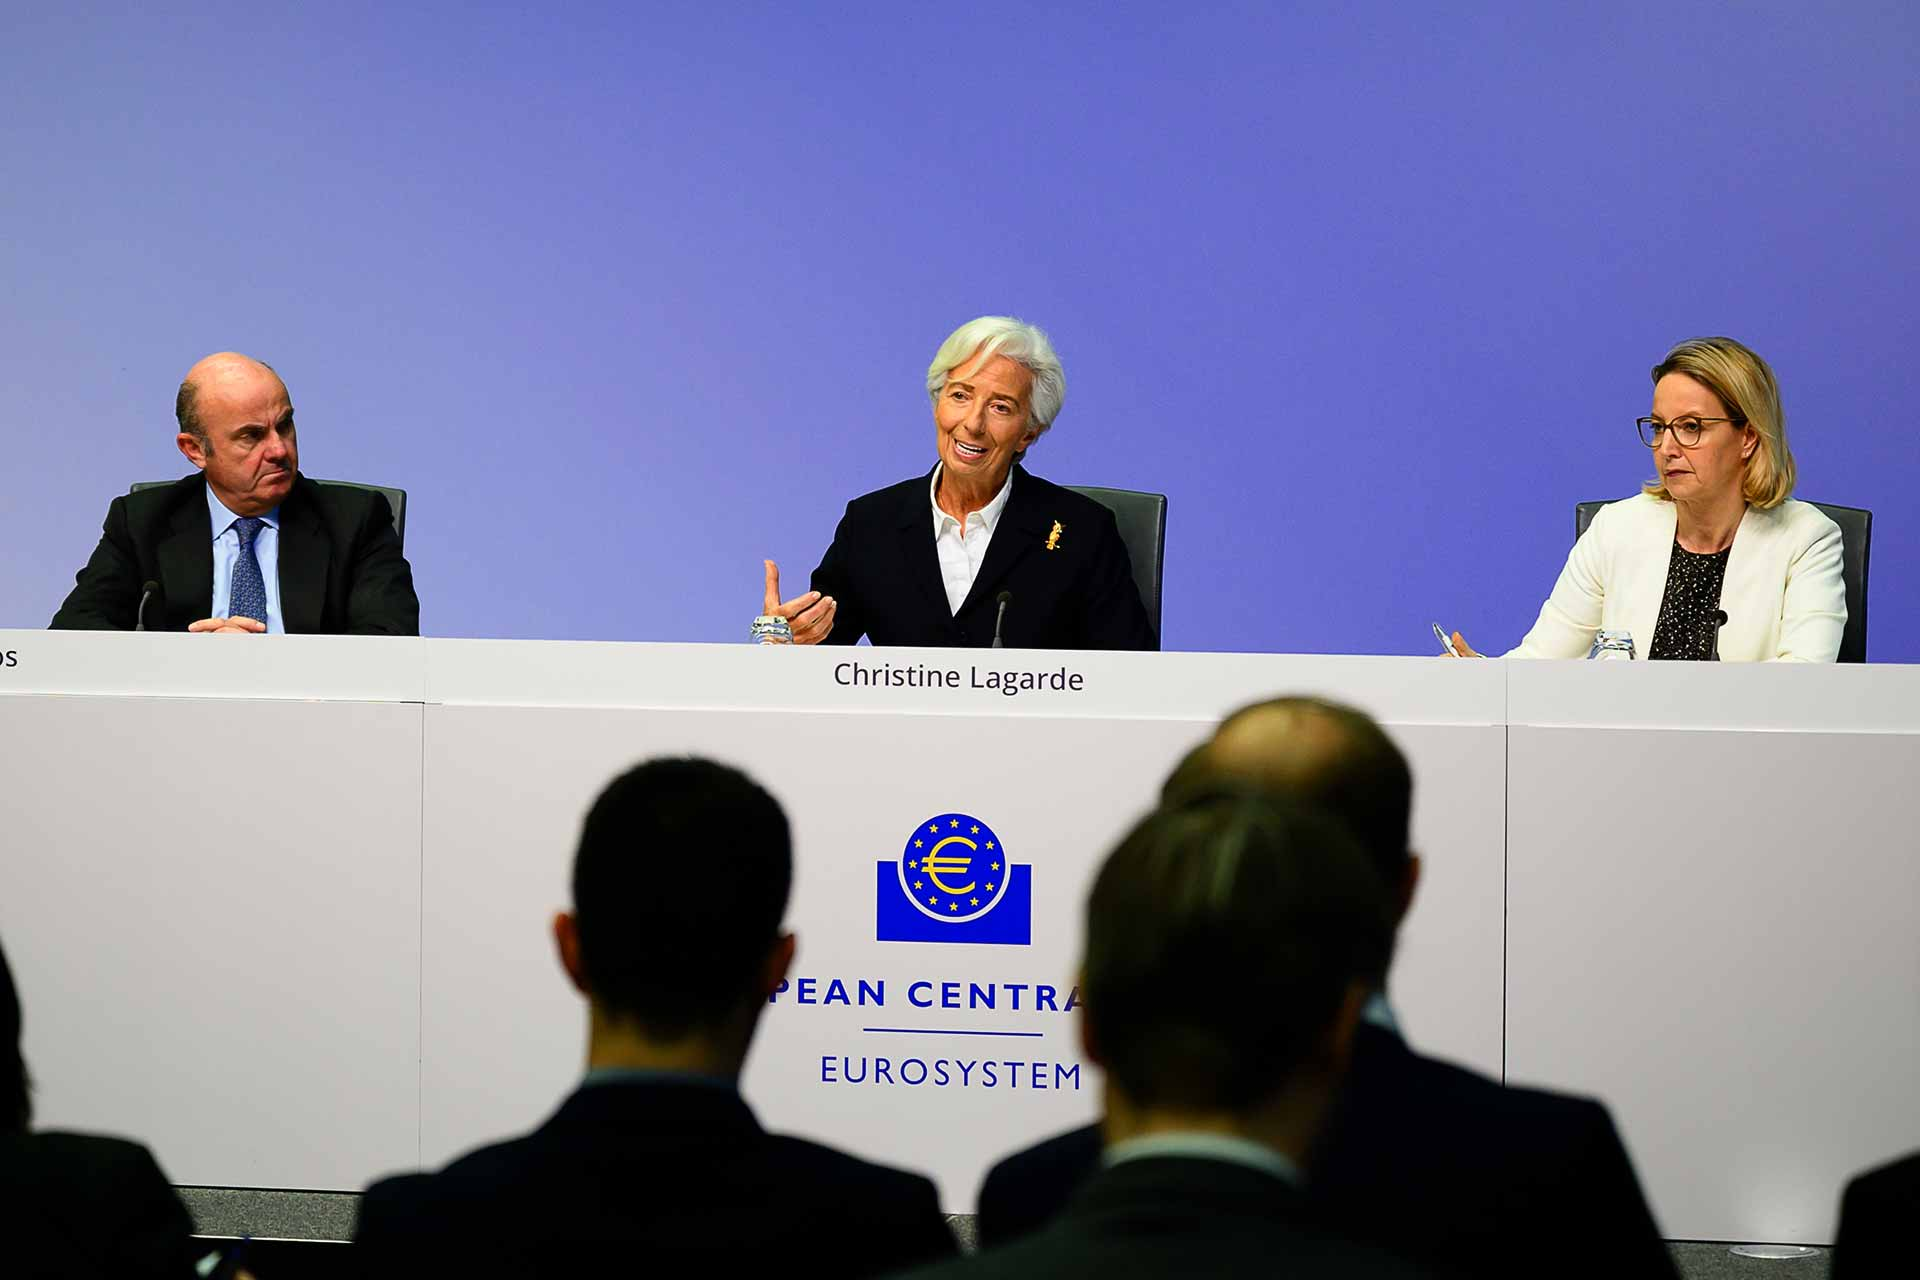 ECB President Christine Lagarde and Vice-President Luis de Guindos